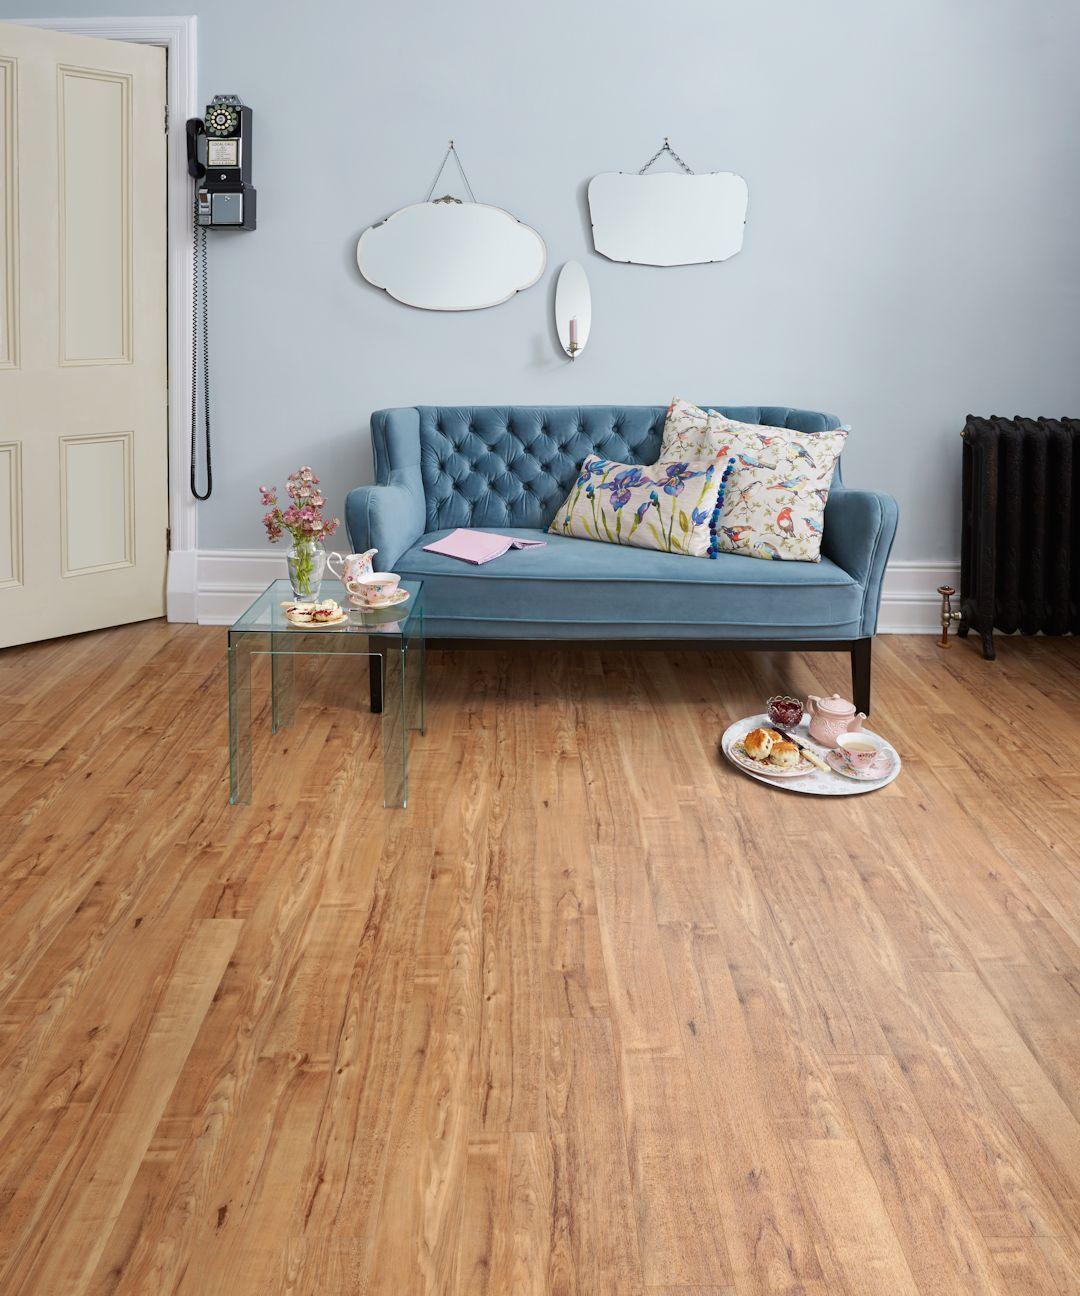 Nut tree camaro luxury vinyl tile flooring featured in living nut tree camaro luxury vinyl tile flooring featured in living room dailygadgetfo Image collections